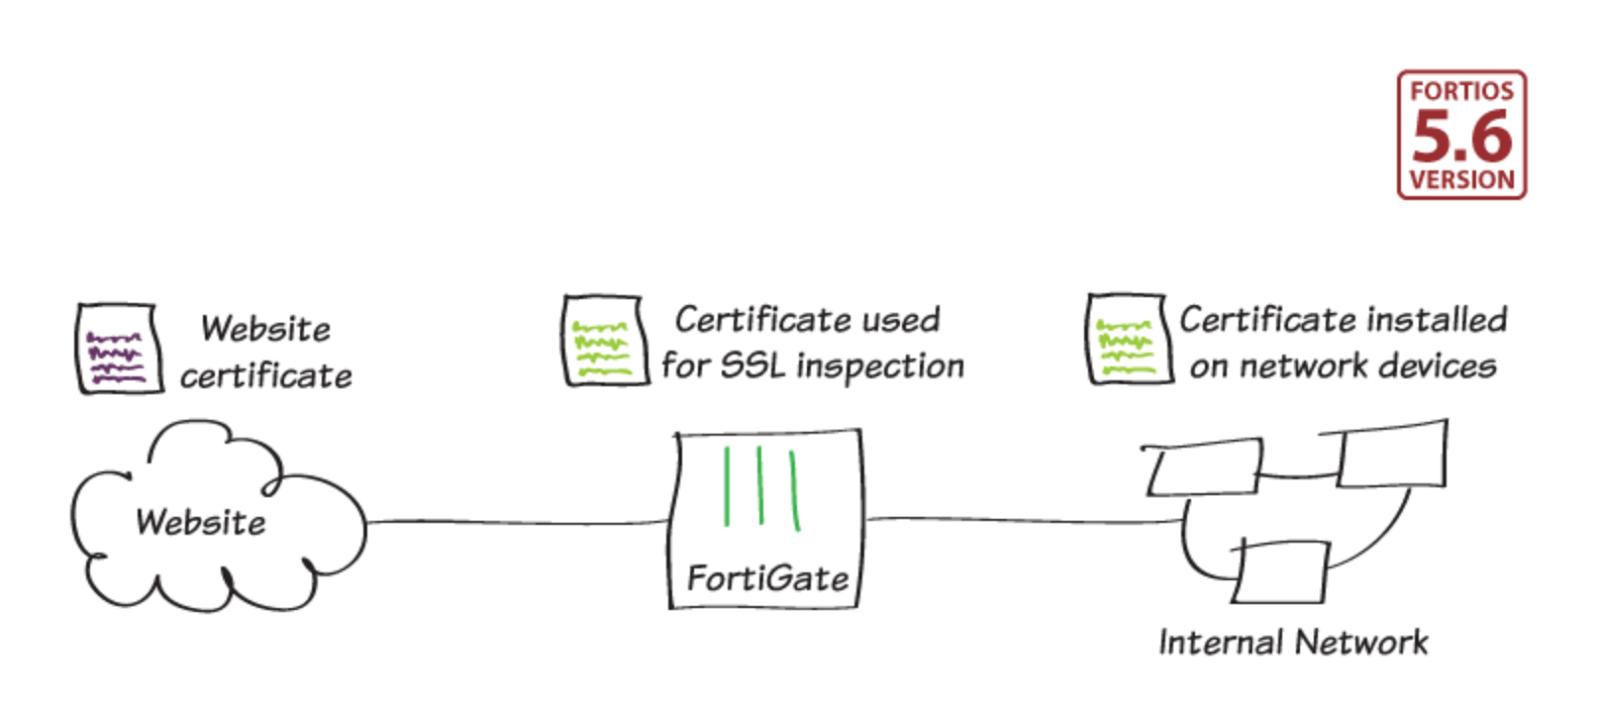 Fortios 56 prevenir alertas de certificados ssl xflitez Images